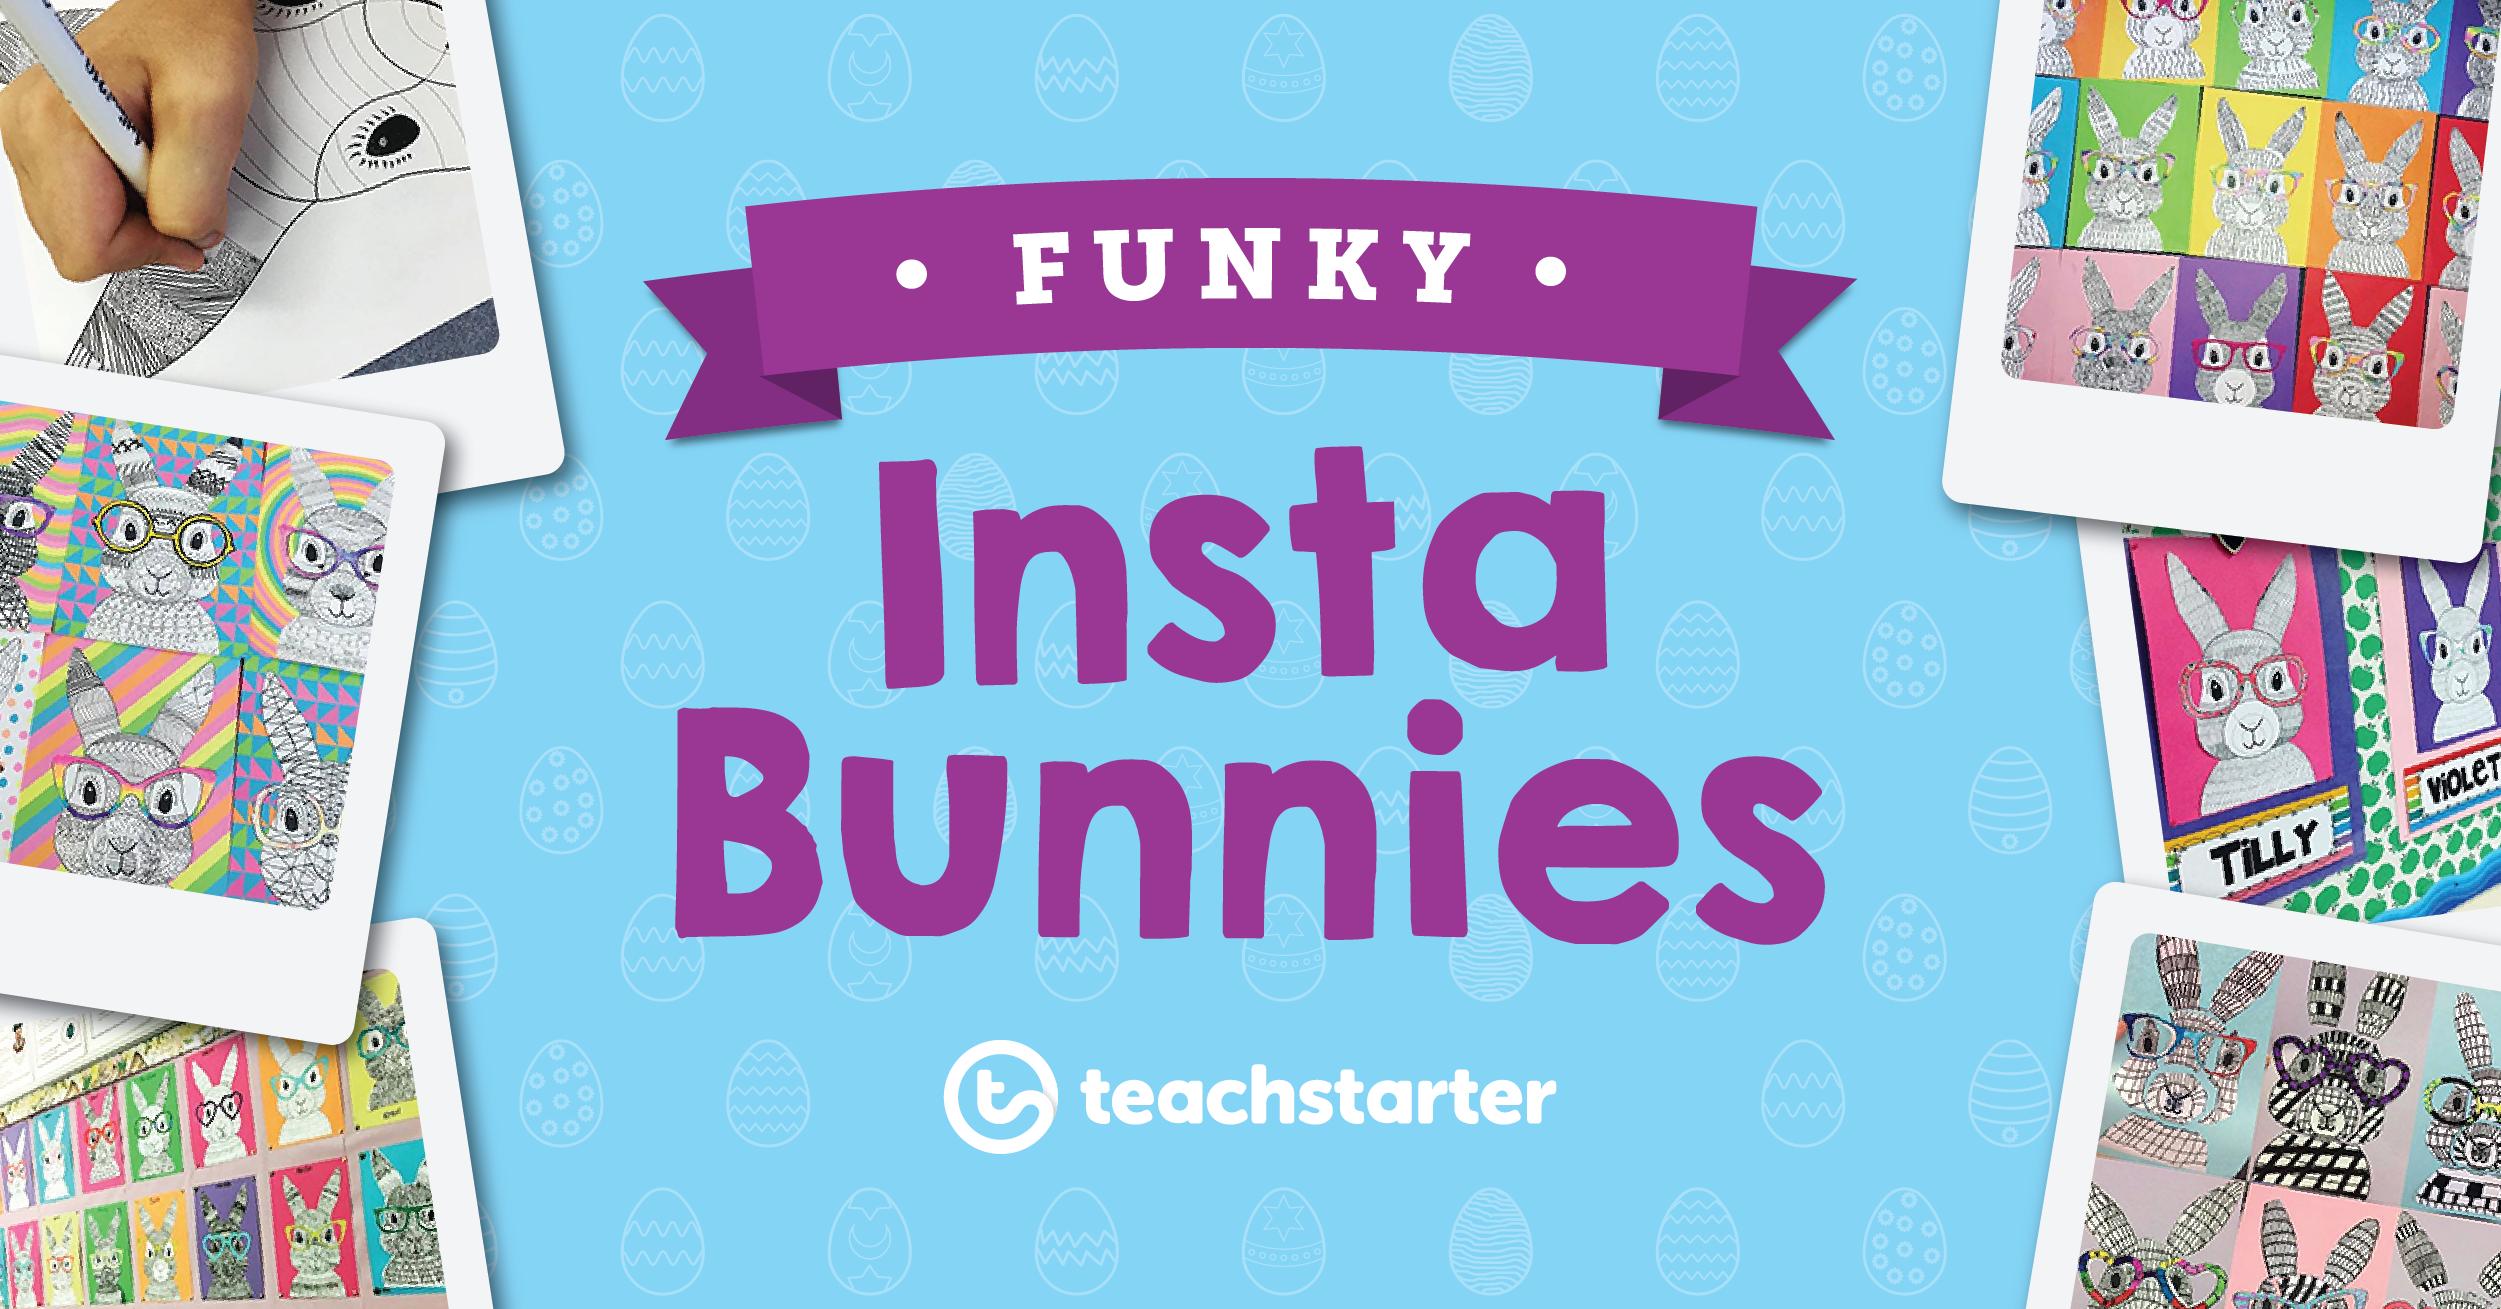 Teach Starter Funky Easter Bunny Craft Idea